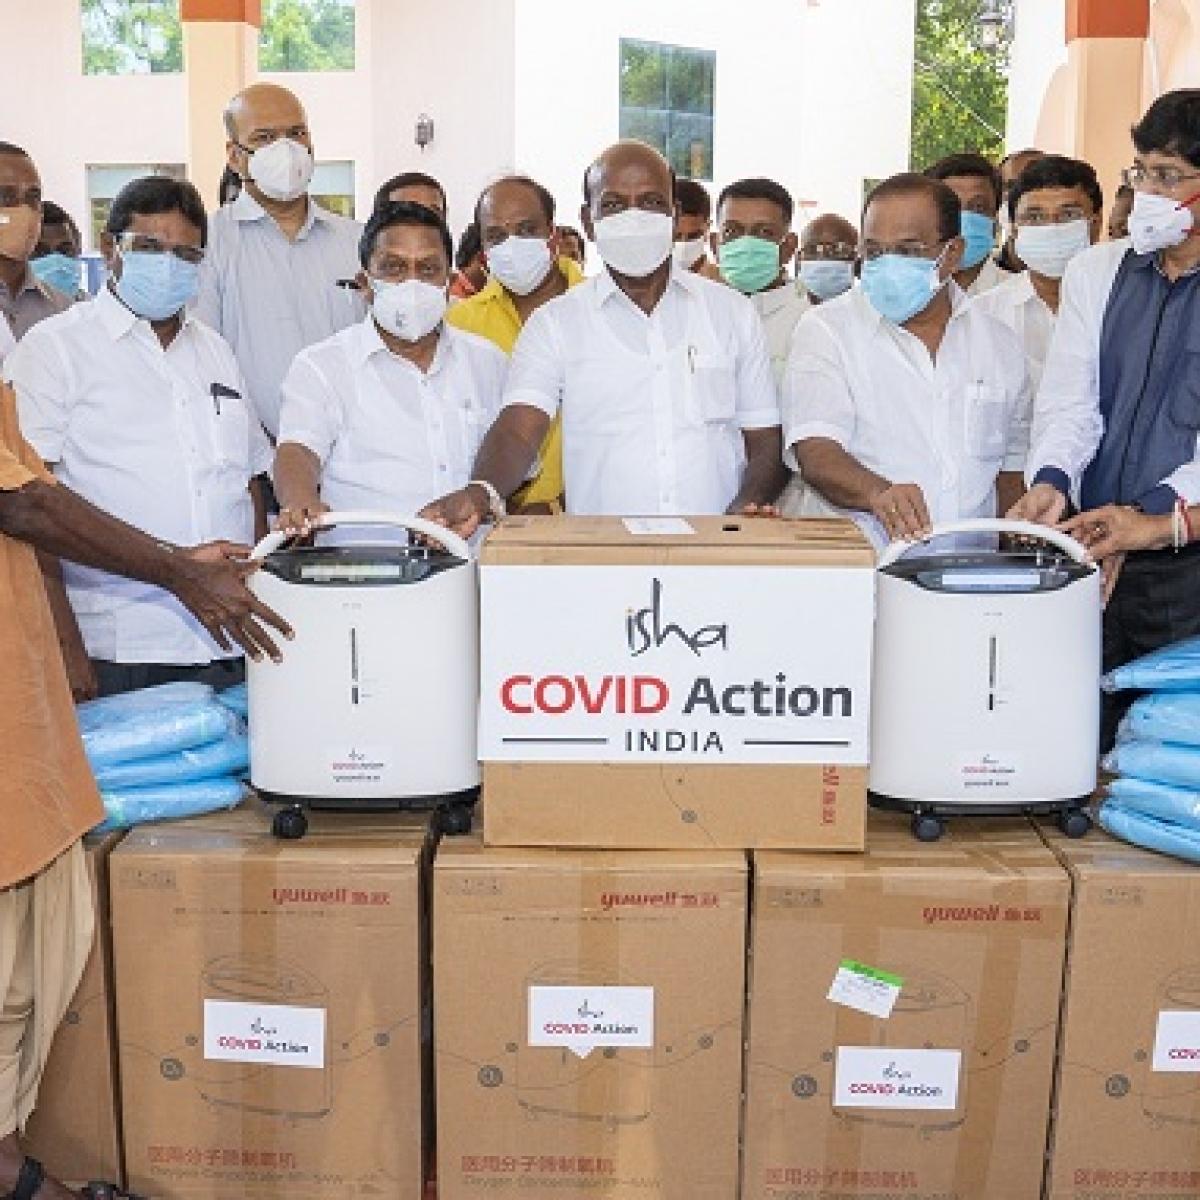 Covid-19: Sadhguru's Isha Outreach donates 500 oxygen concentrators to Tamil Nadu government